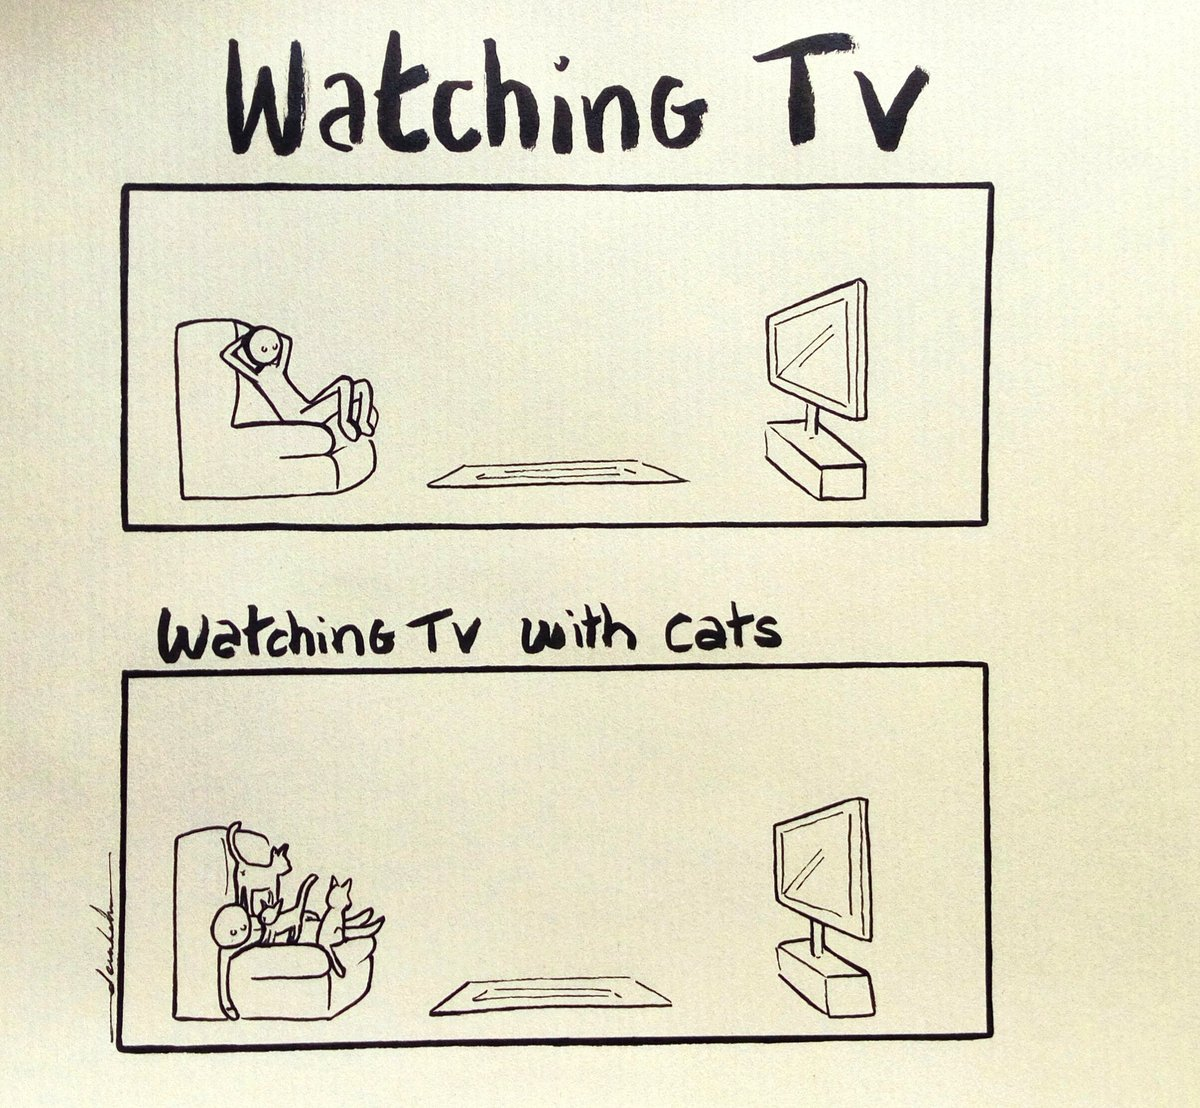 Watching TV with cats #dailyart #dailyillustration #cats #watchingtv #pets #animals https://t.co/Qq8ZH5X2pM